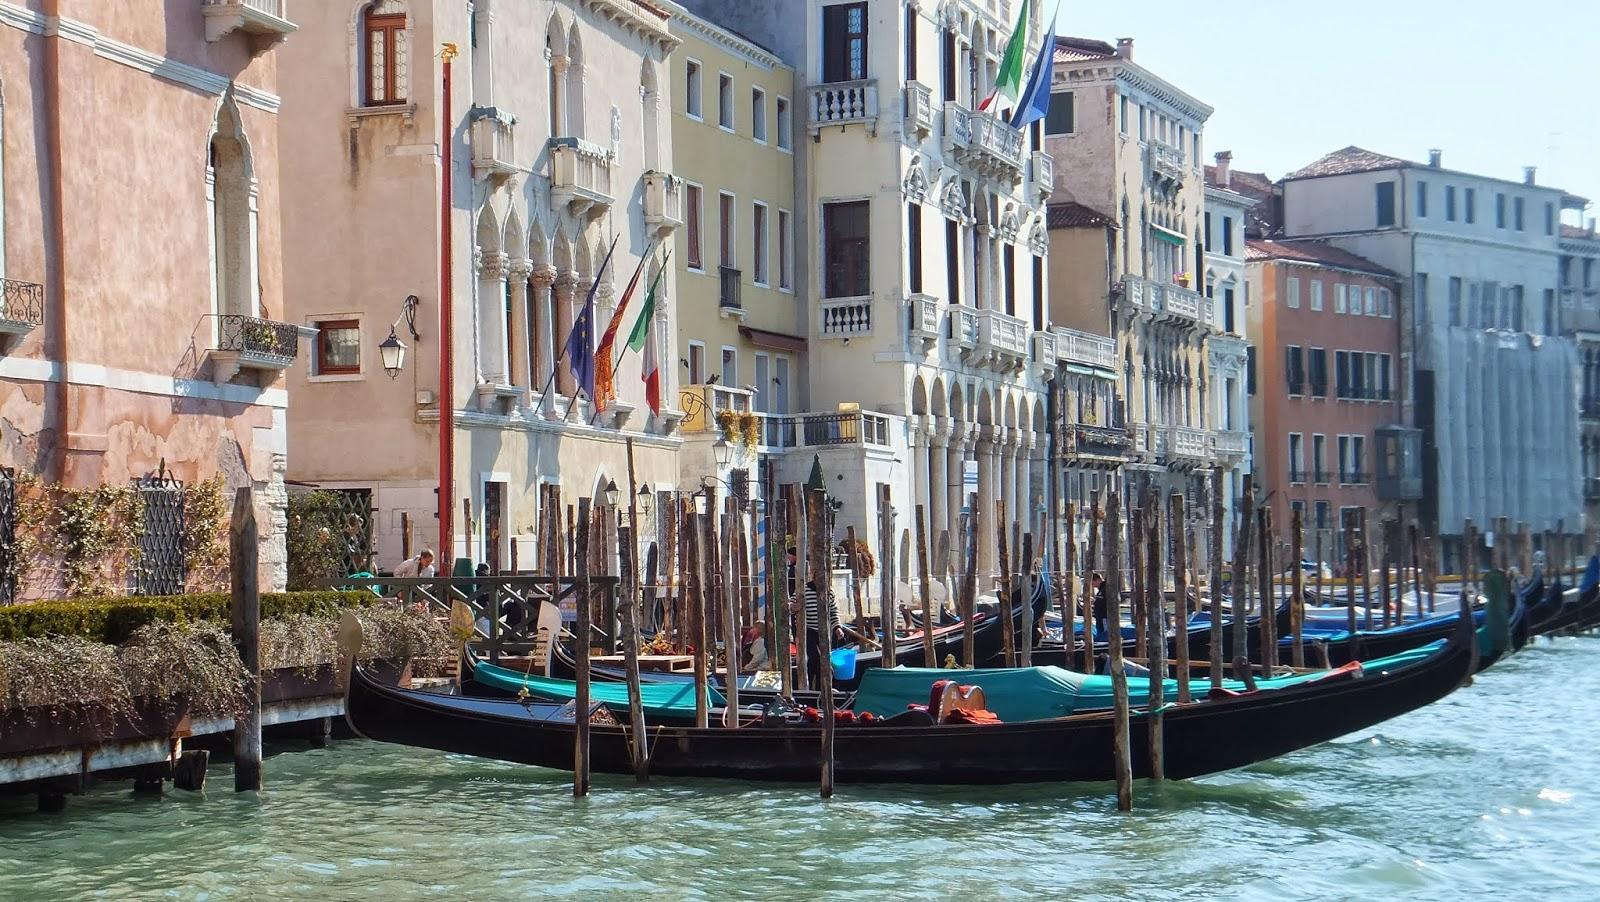 Canales de Venecia, Venezia, Italia, Elisa N, Blog de Viajes, Lifestyle, Travel